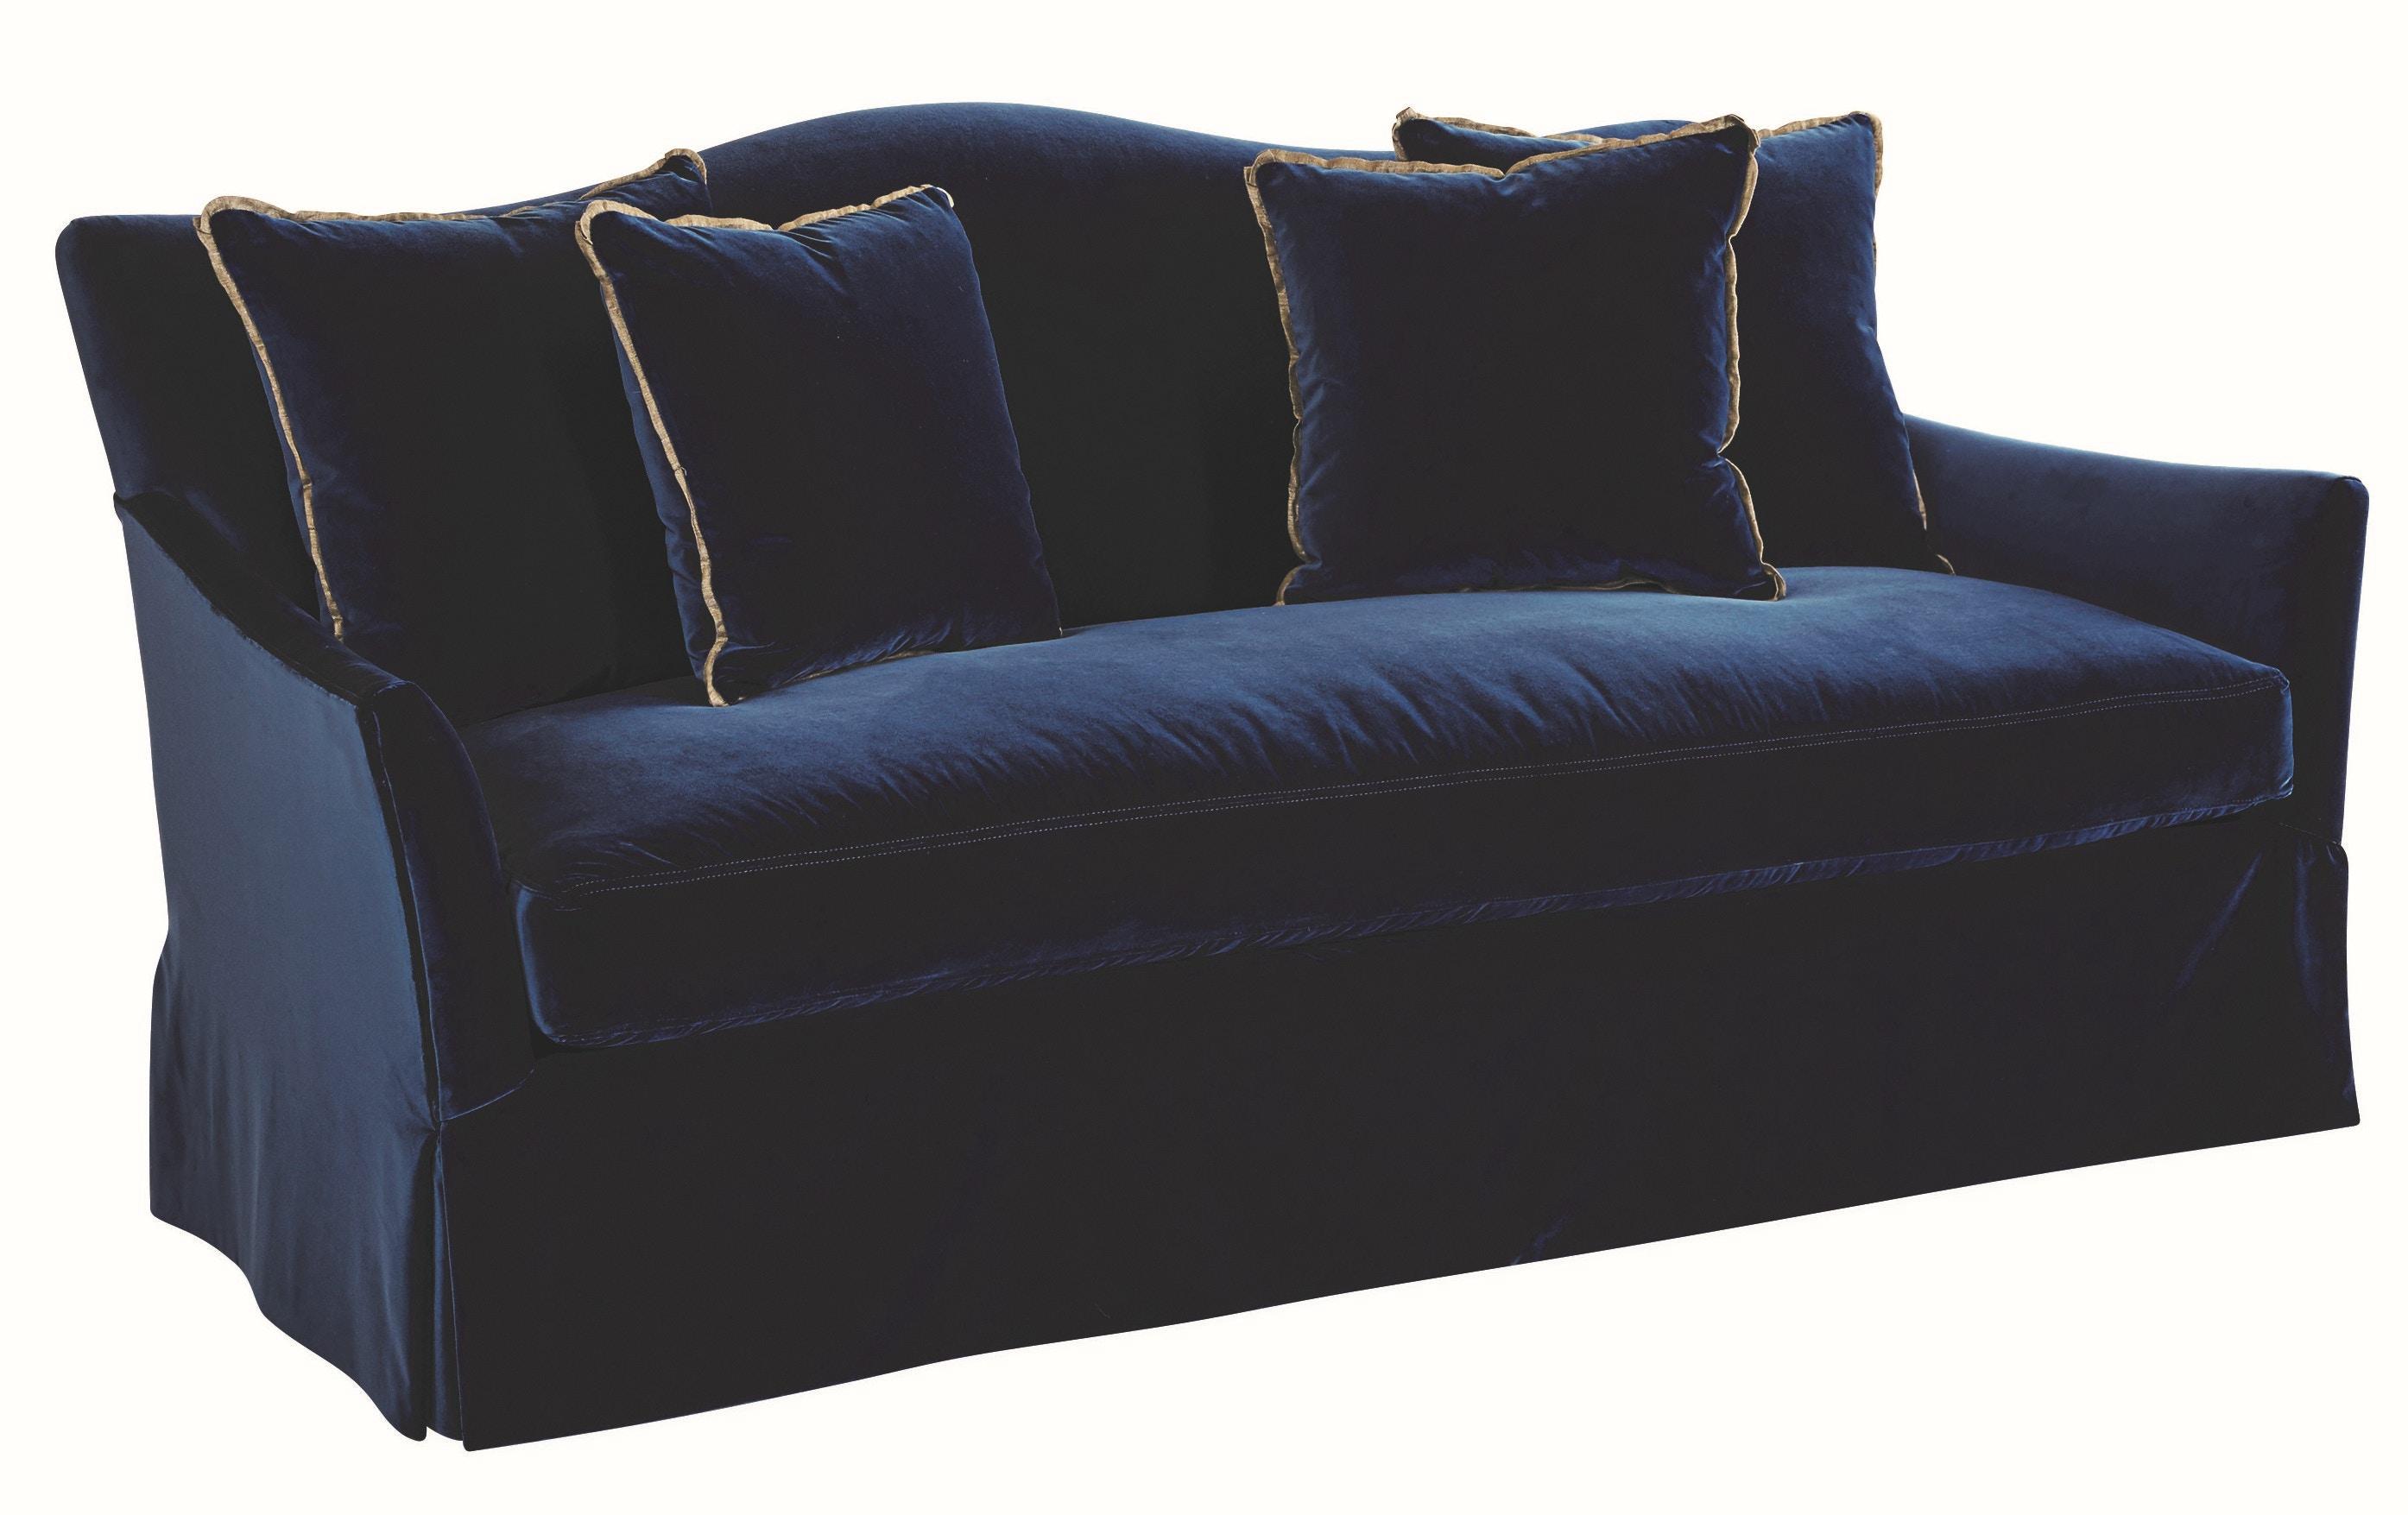 lee industries sofa prices super amart set living room apartment 3221 11 toms